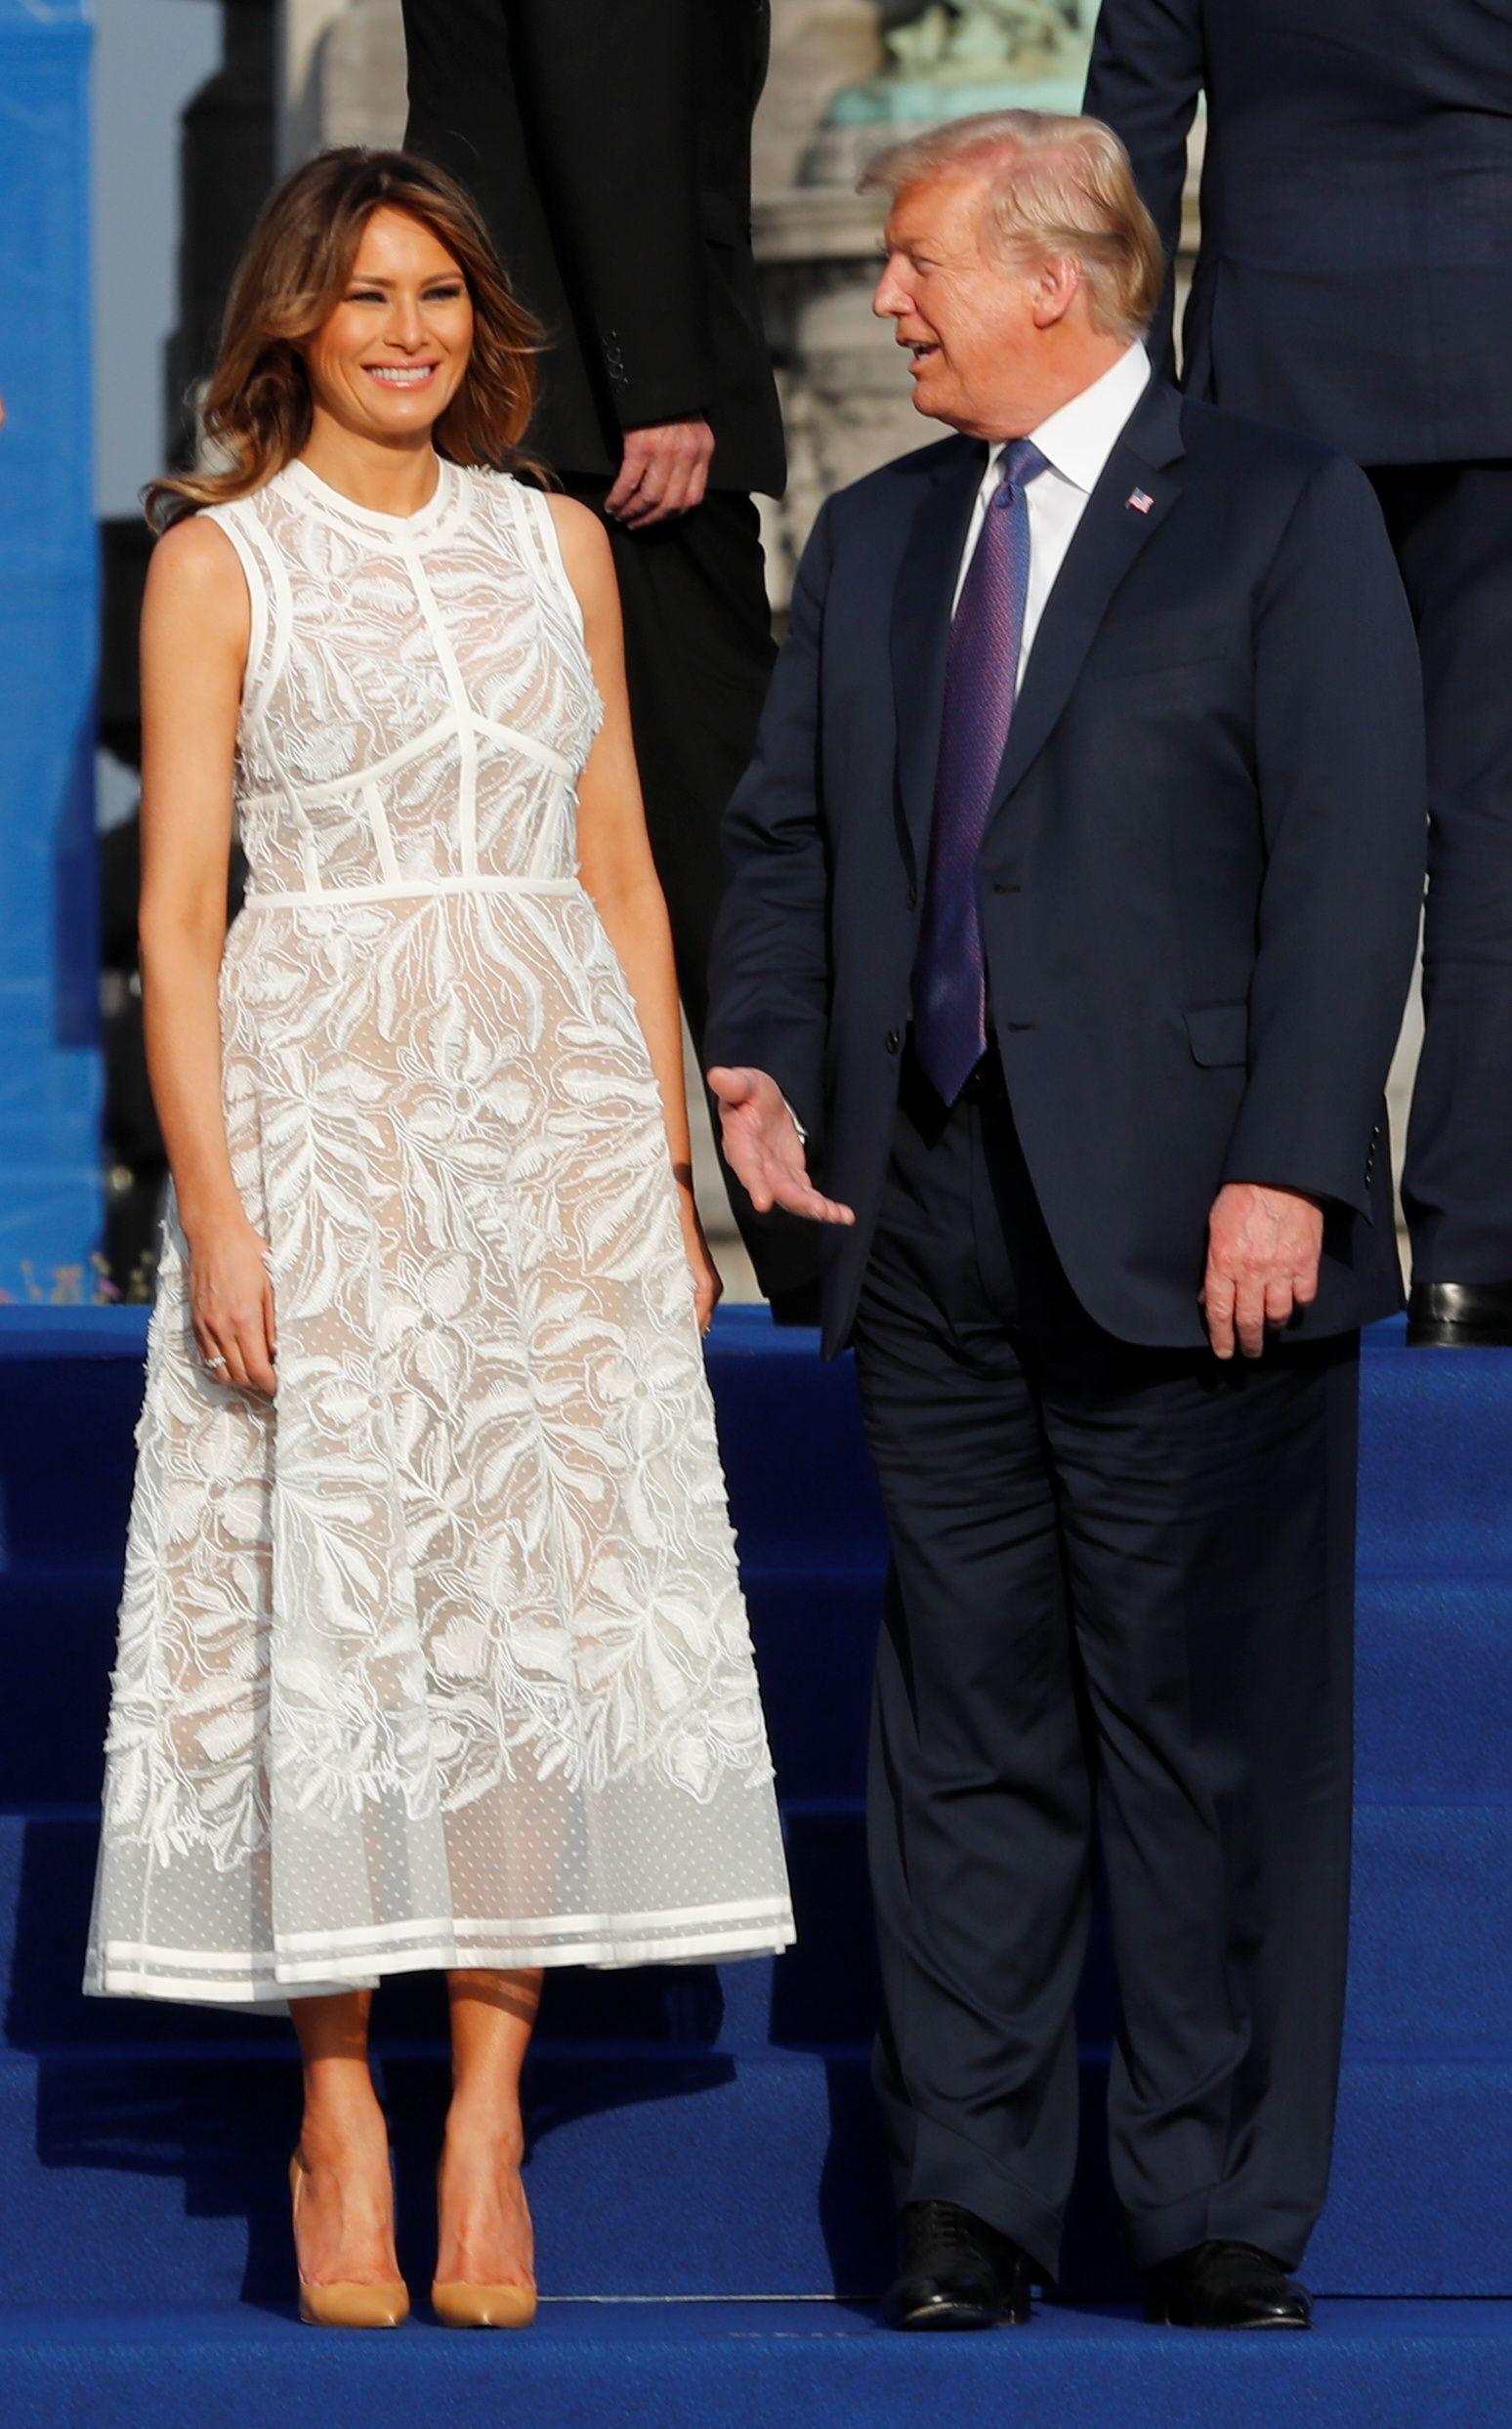 e23256364a3d Tremendous fan  Melania Trump meets Queen Elizabeth in Dior in 2019 ...